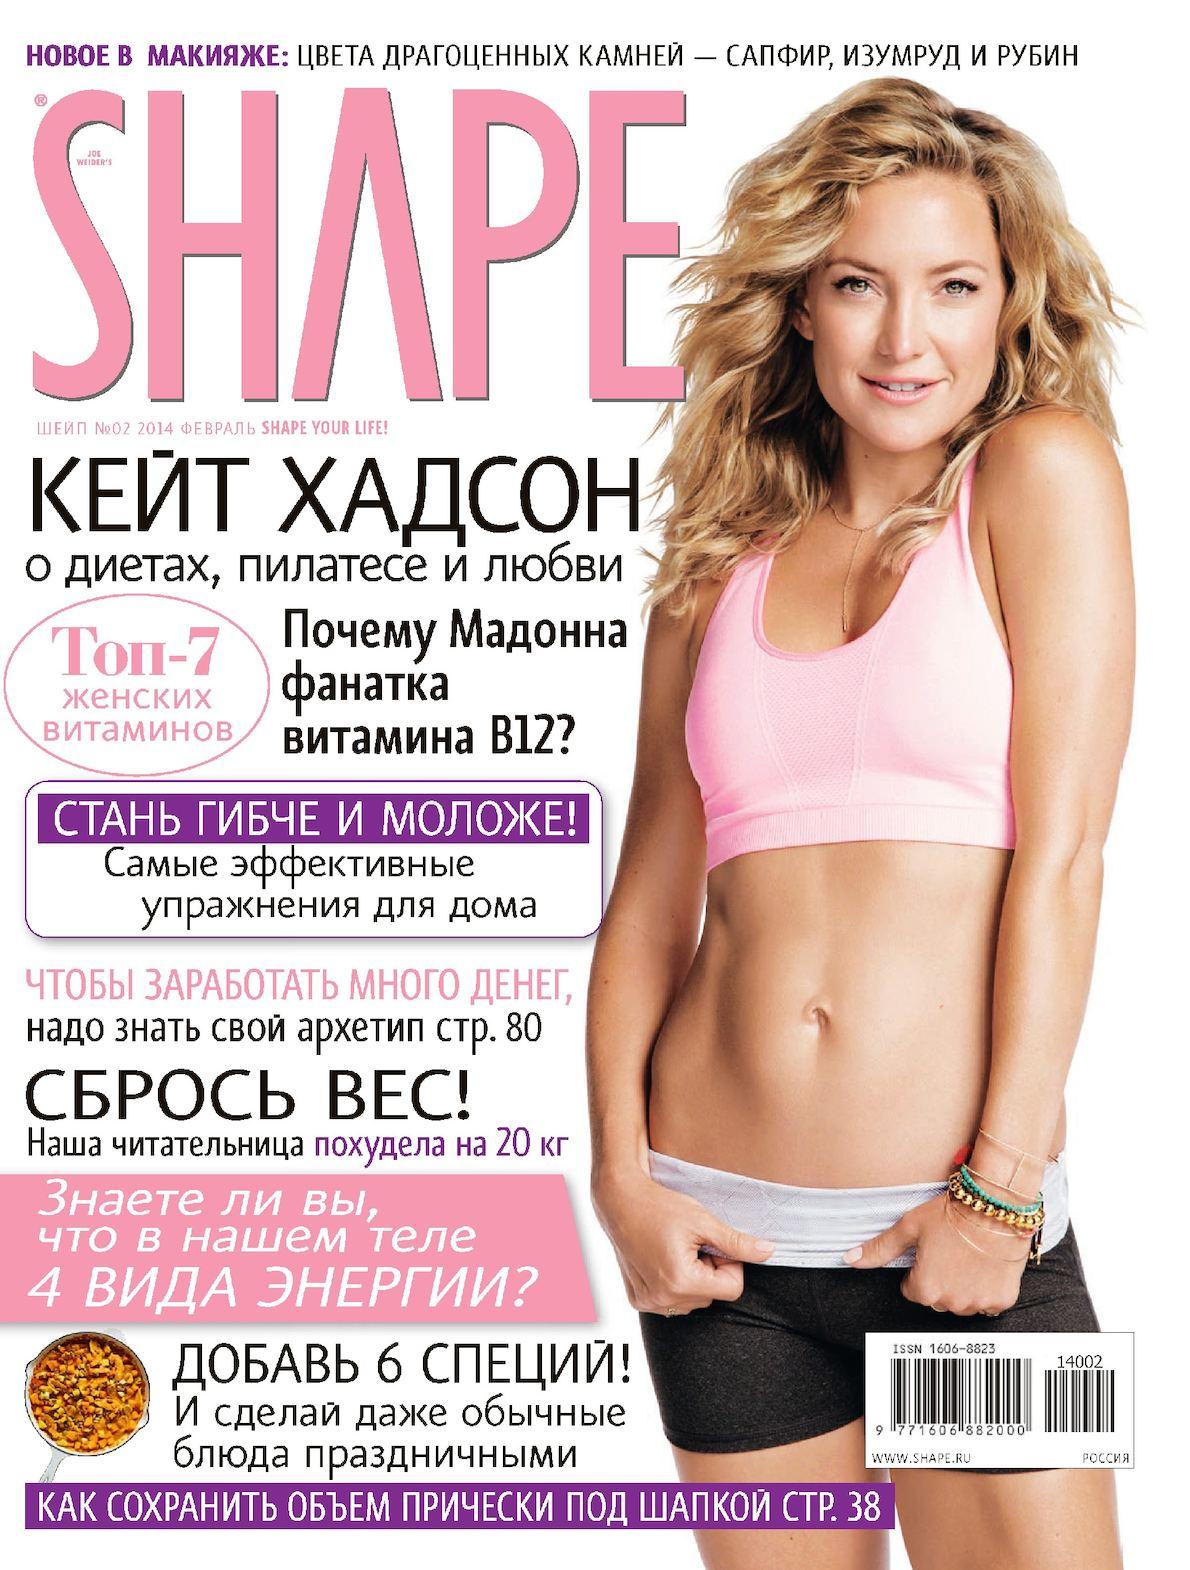 Кейт хадсон рост и вес, параметры фигуры, пластика, секреты красоты, как худеет, диета + фото